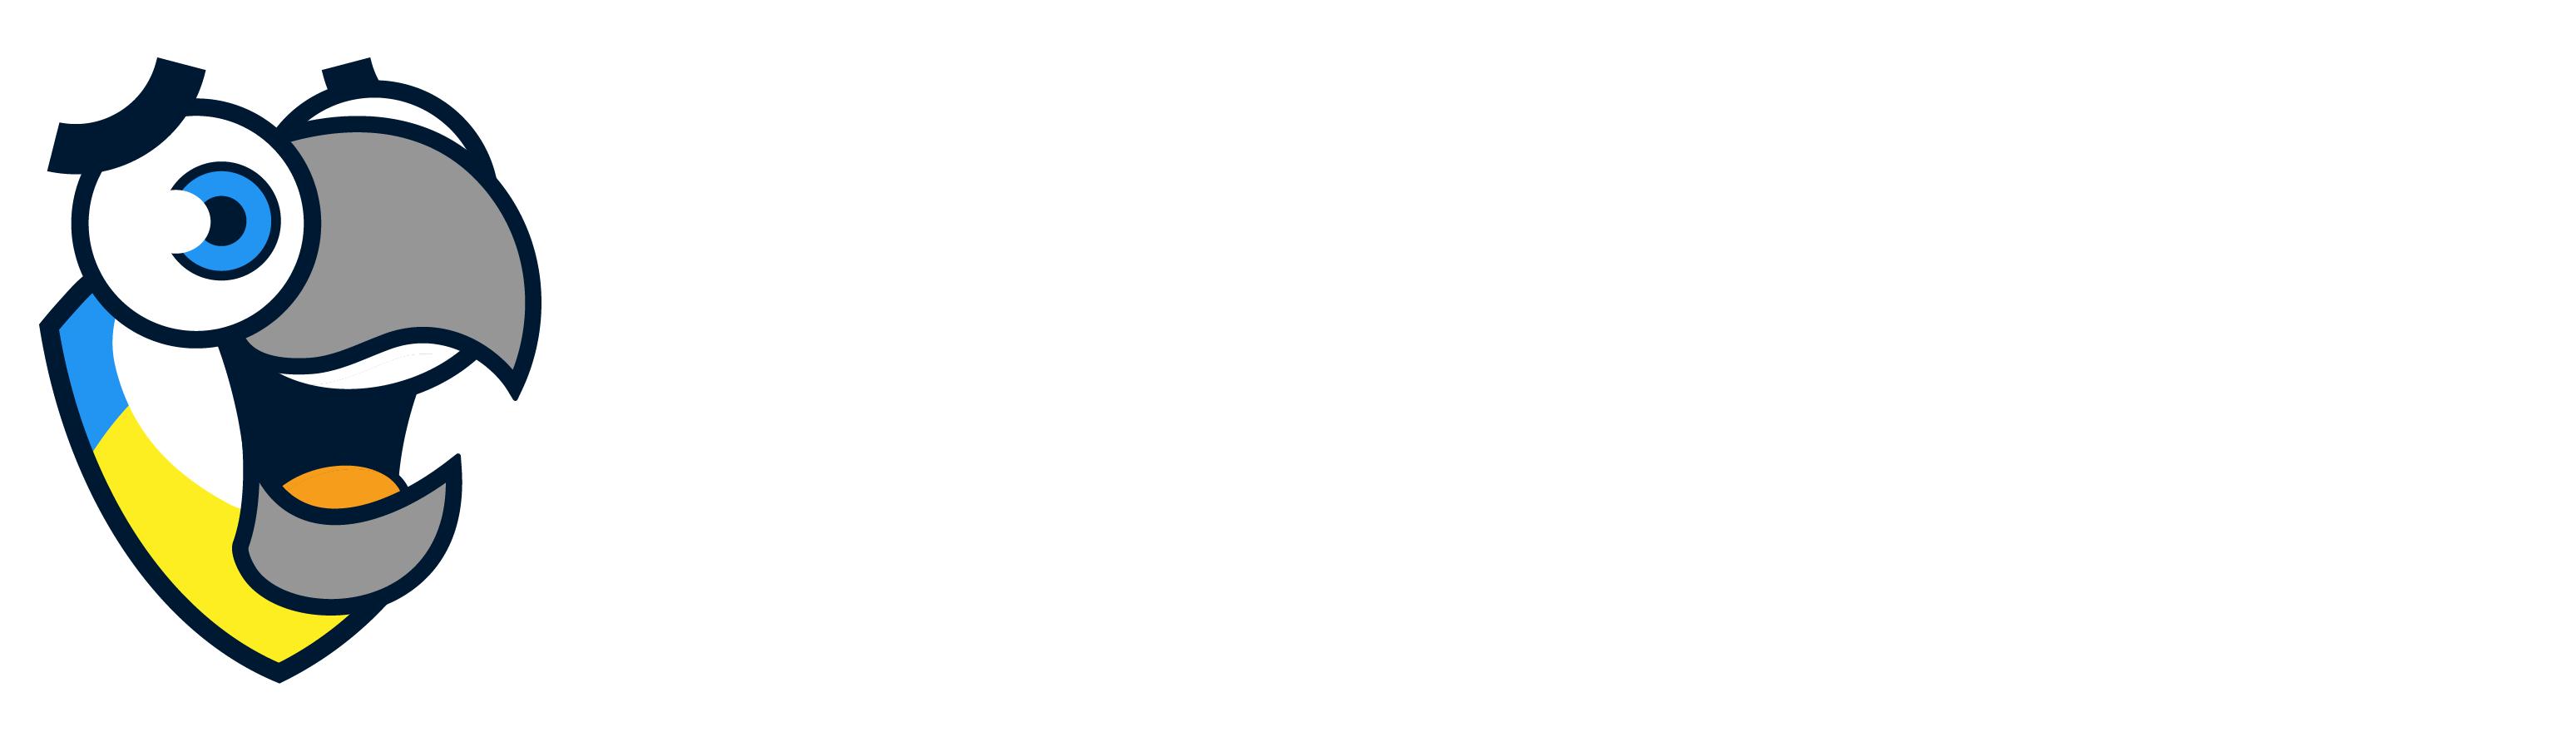 VoiceIQ logo